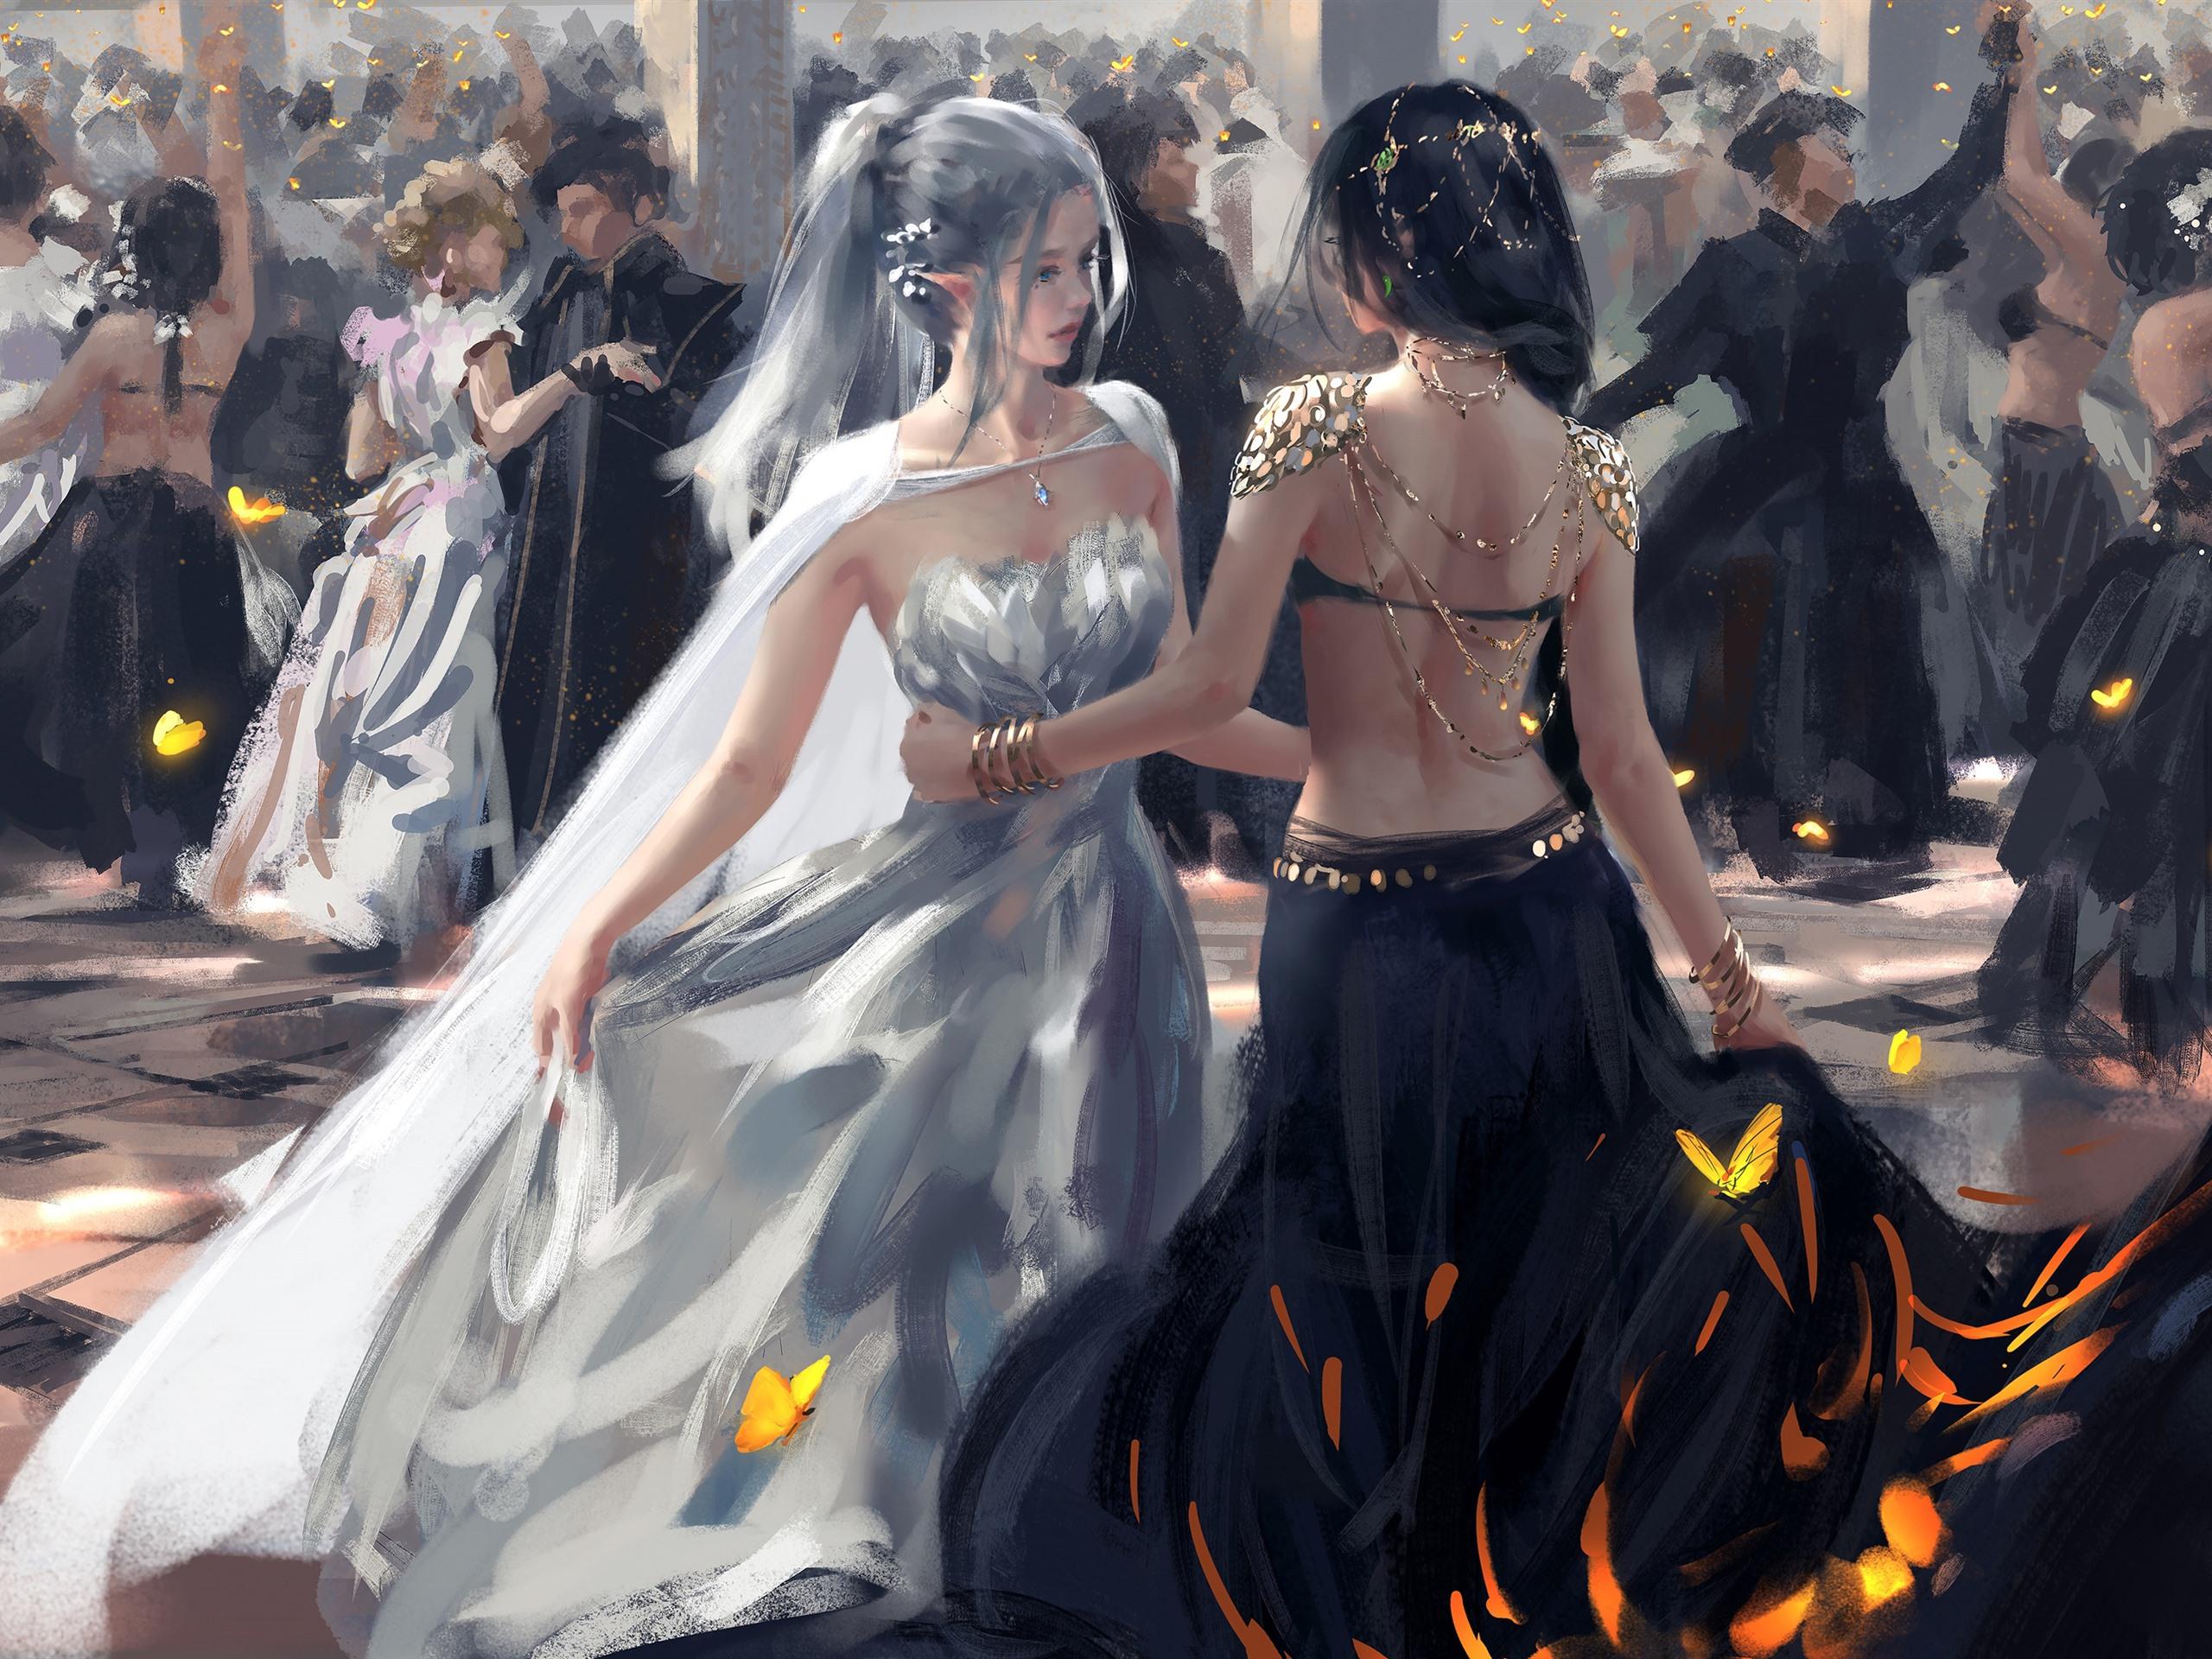 Wallpaper Dancing Girls Elf Fantasy Art Picture 3840x2160